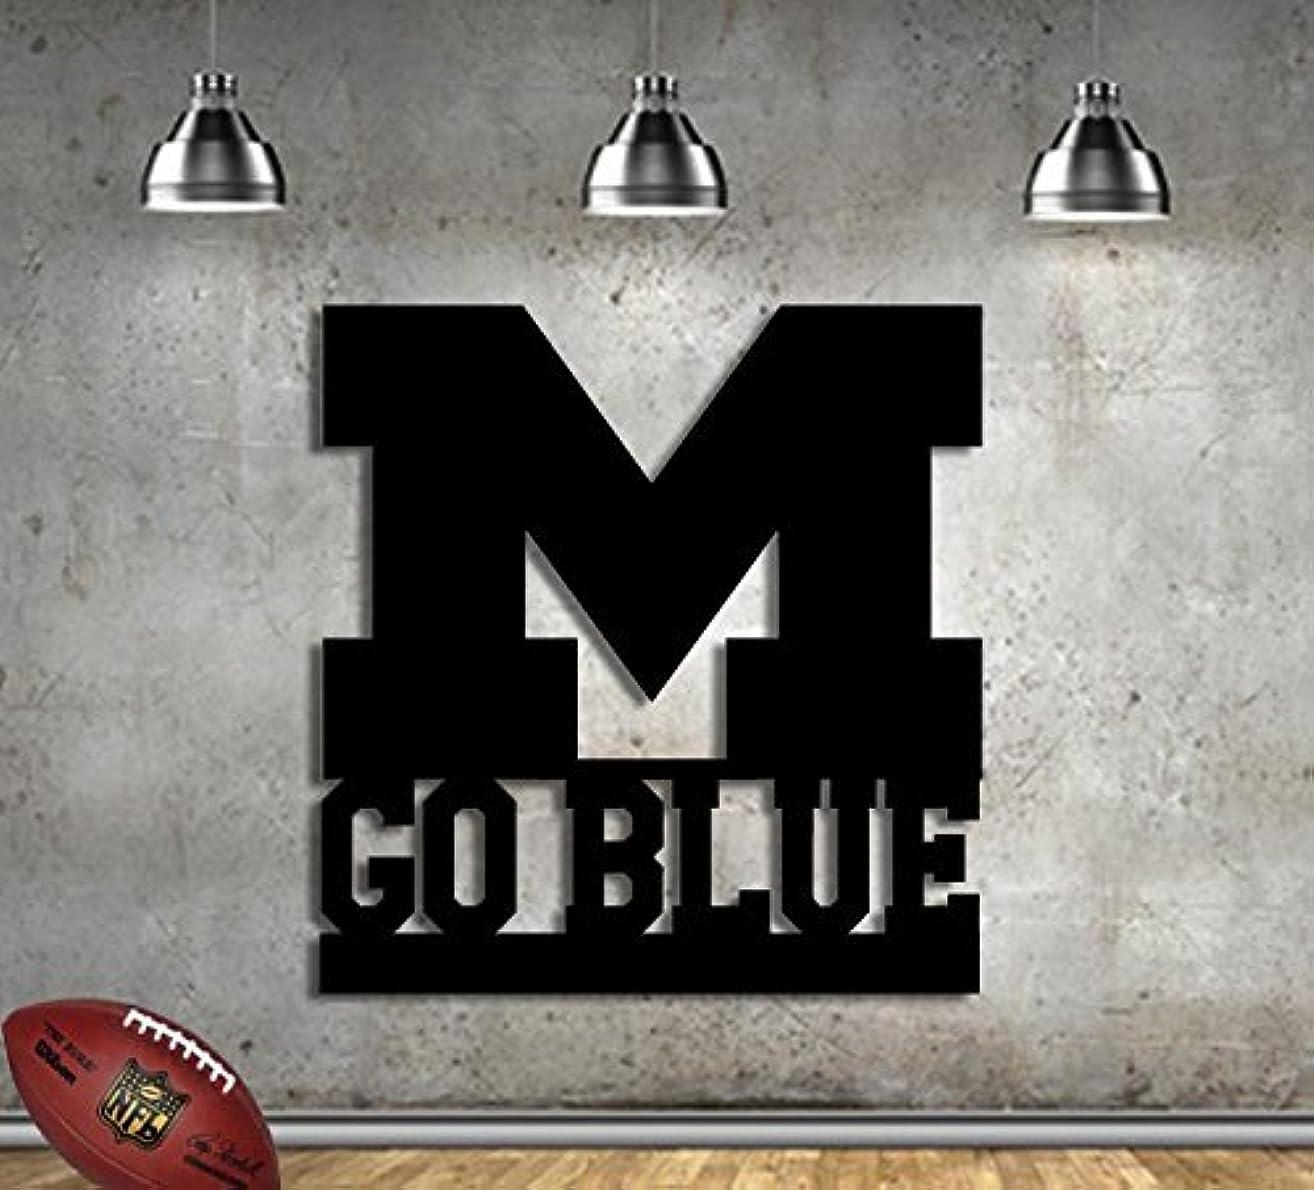 Michigan Football Sign- College Football- Metal Sign 22.5 x 23.5 - Man Cave - Football Fan - Metal Wall Art - 14 Gauge Steel Made In USA